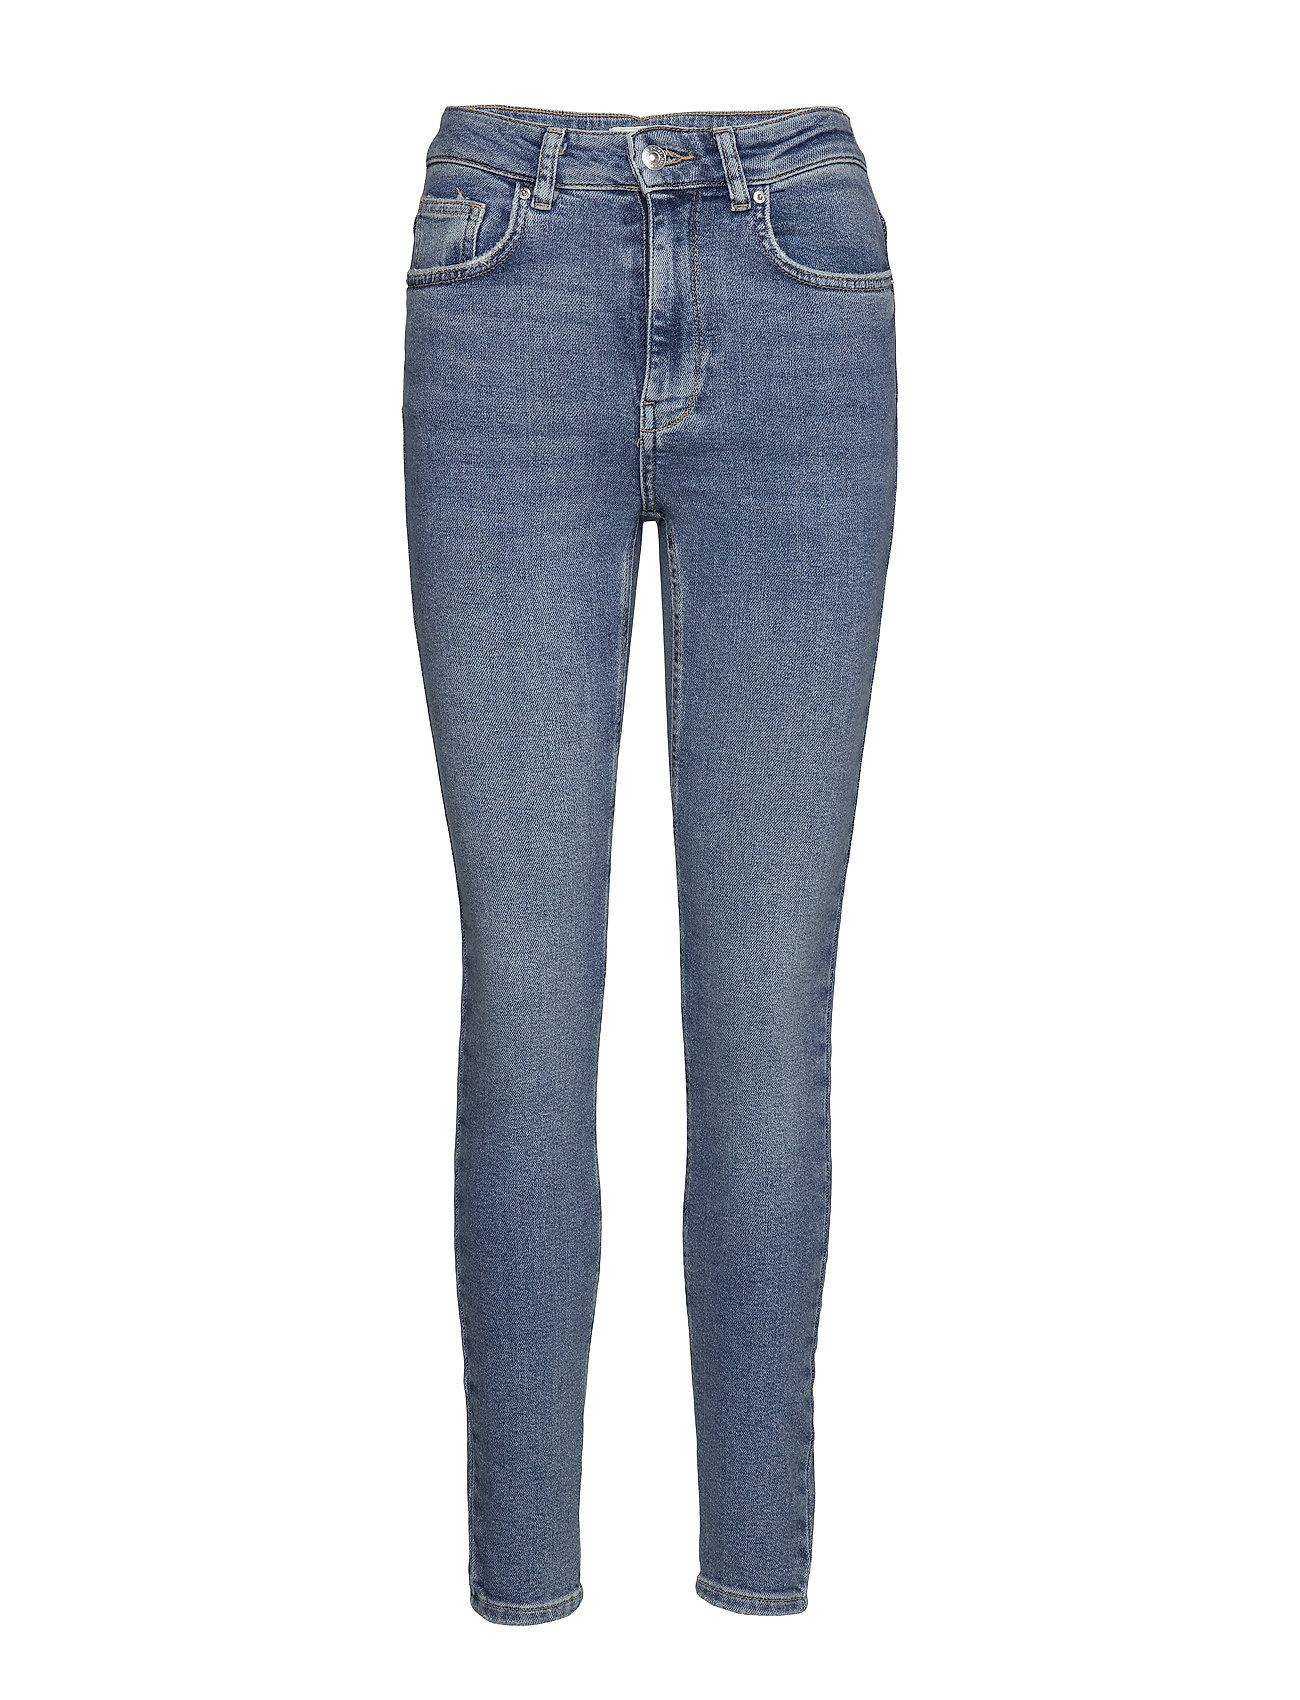 Gina Tricot Hedda original jeans - MIDBLUE F